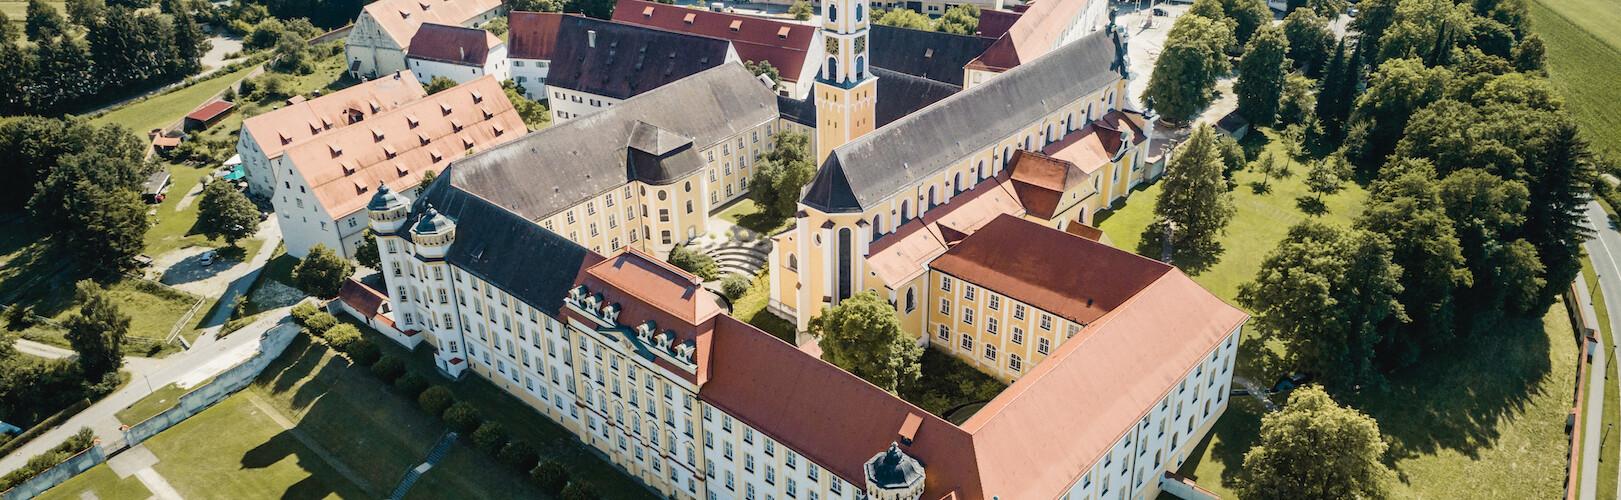 Ochsenhausen Monastery © Oberschwaben Tourismus